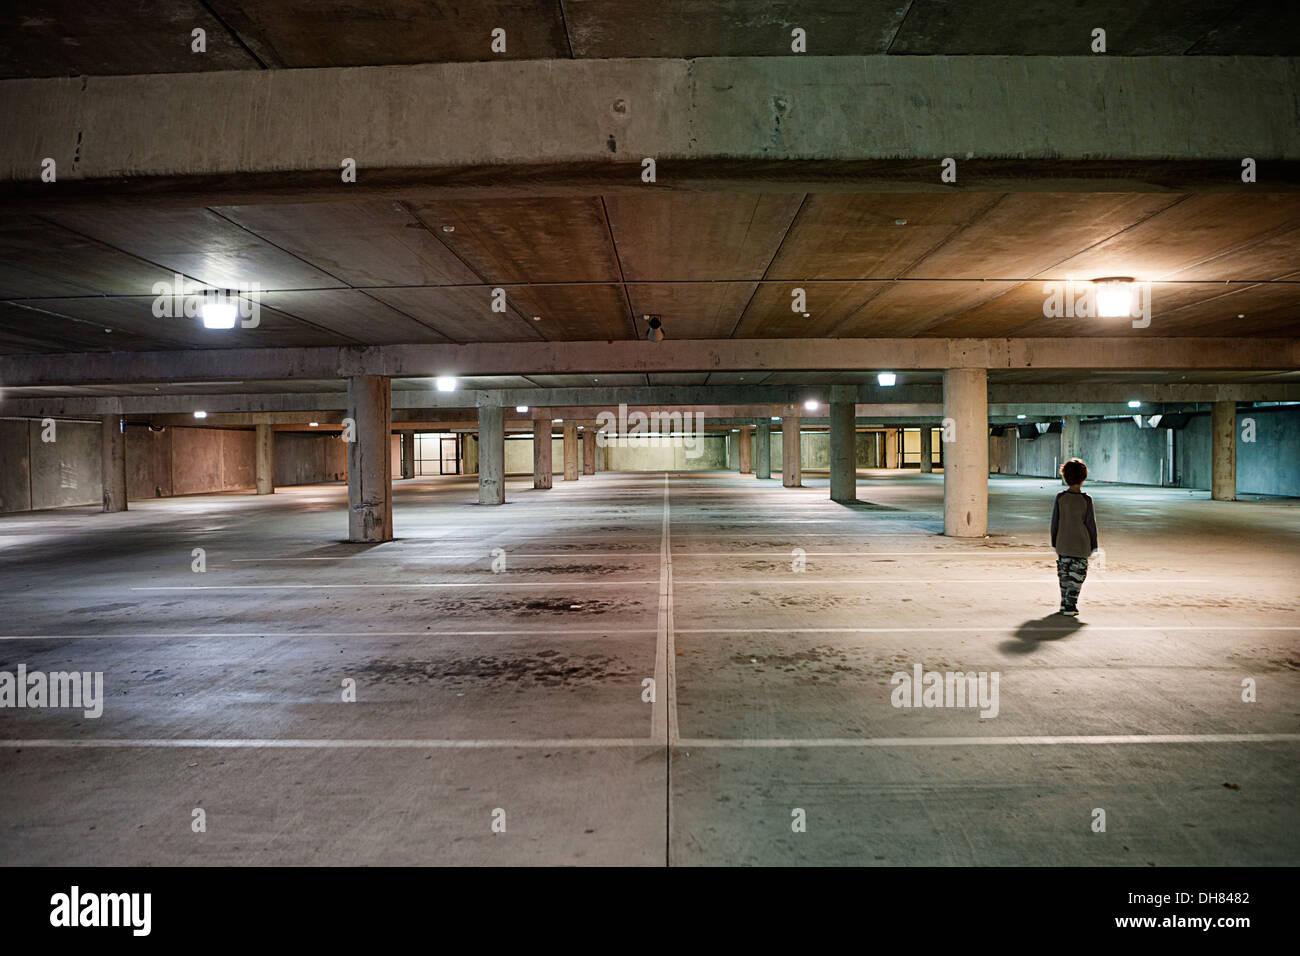 Garçon dans parking souterrain Photo Stock